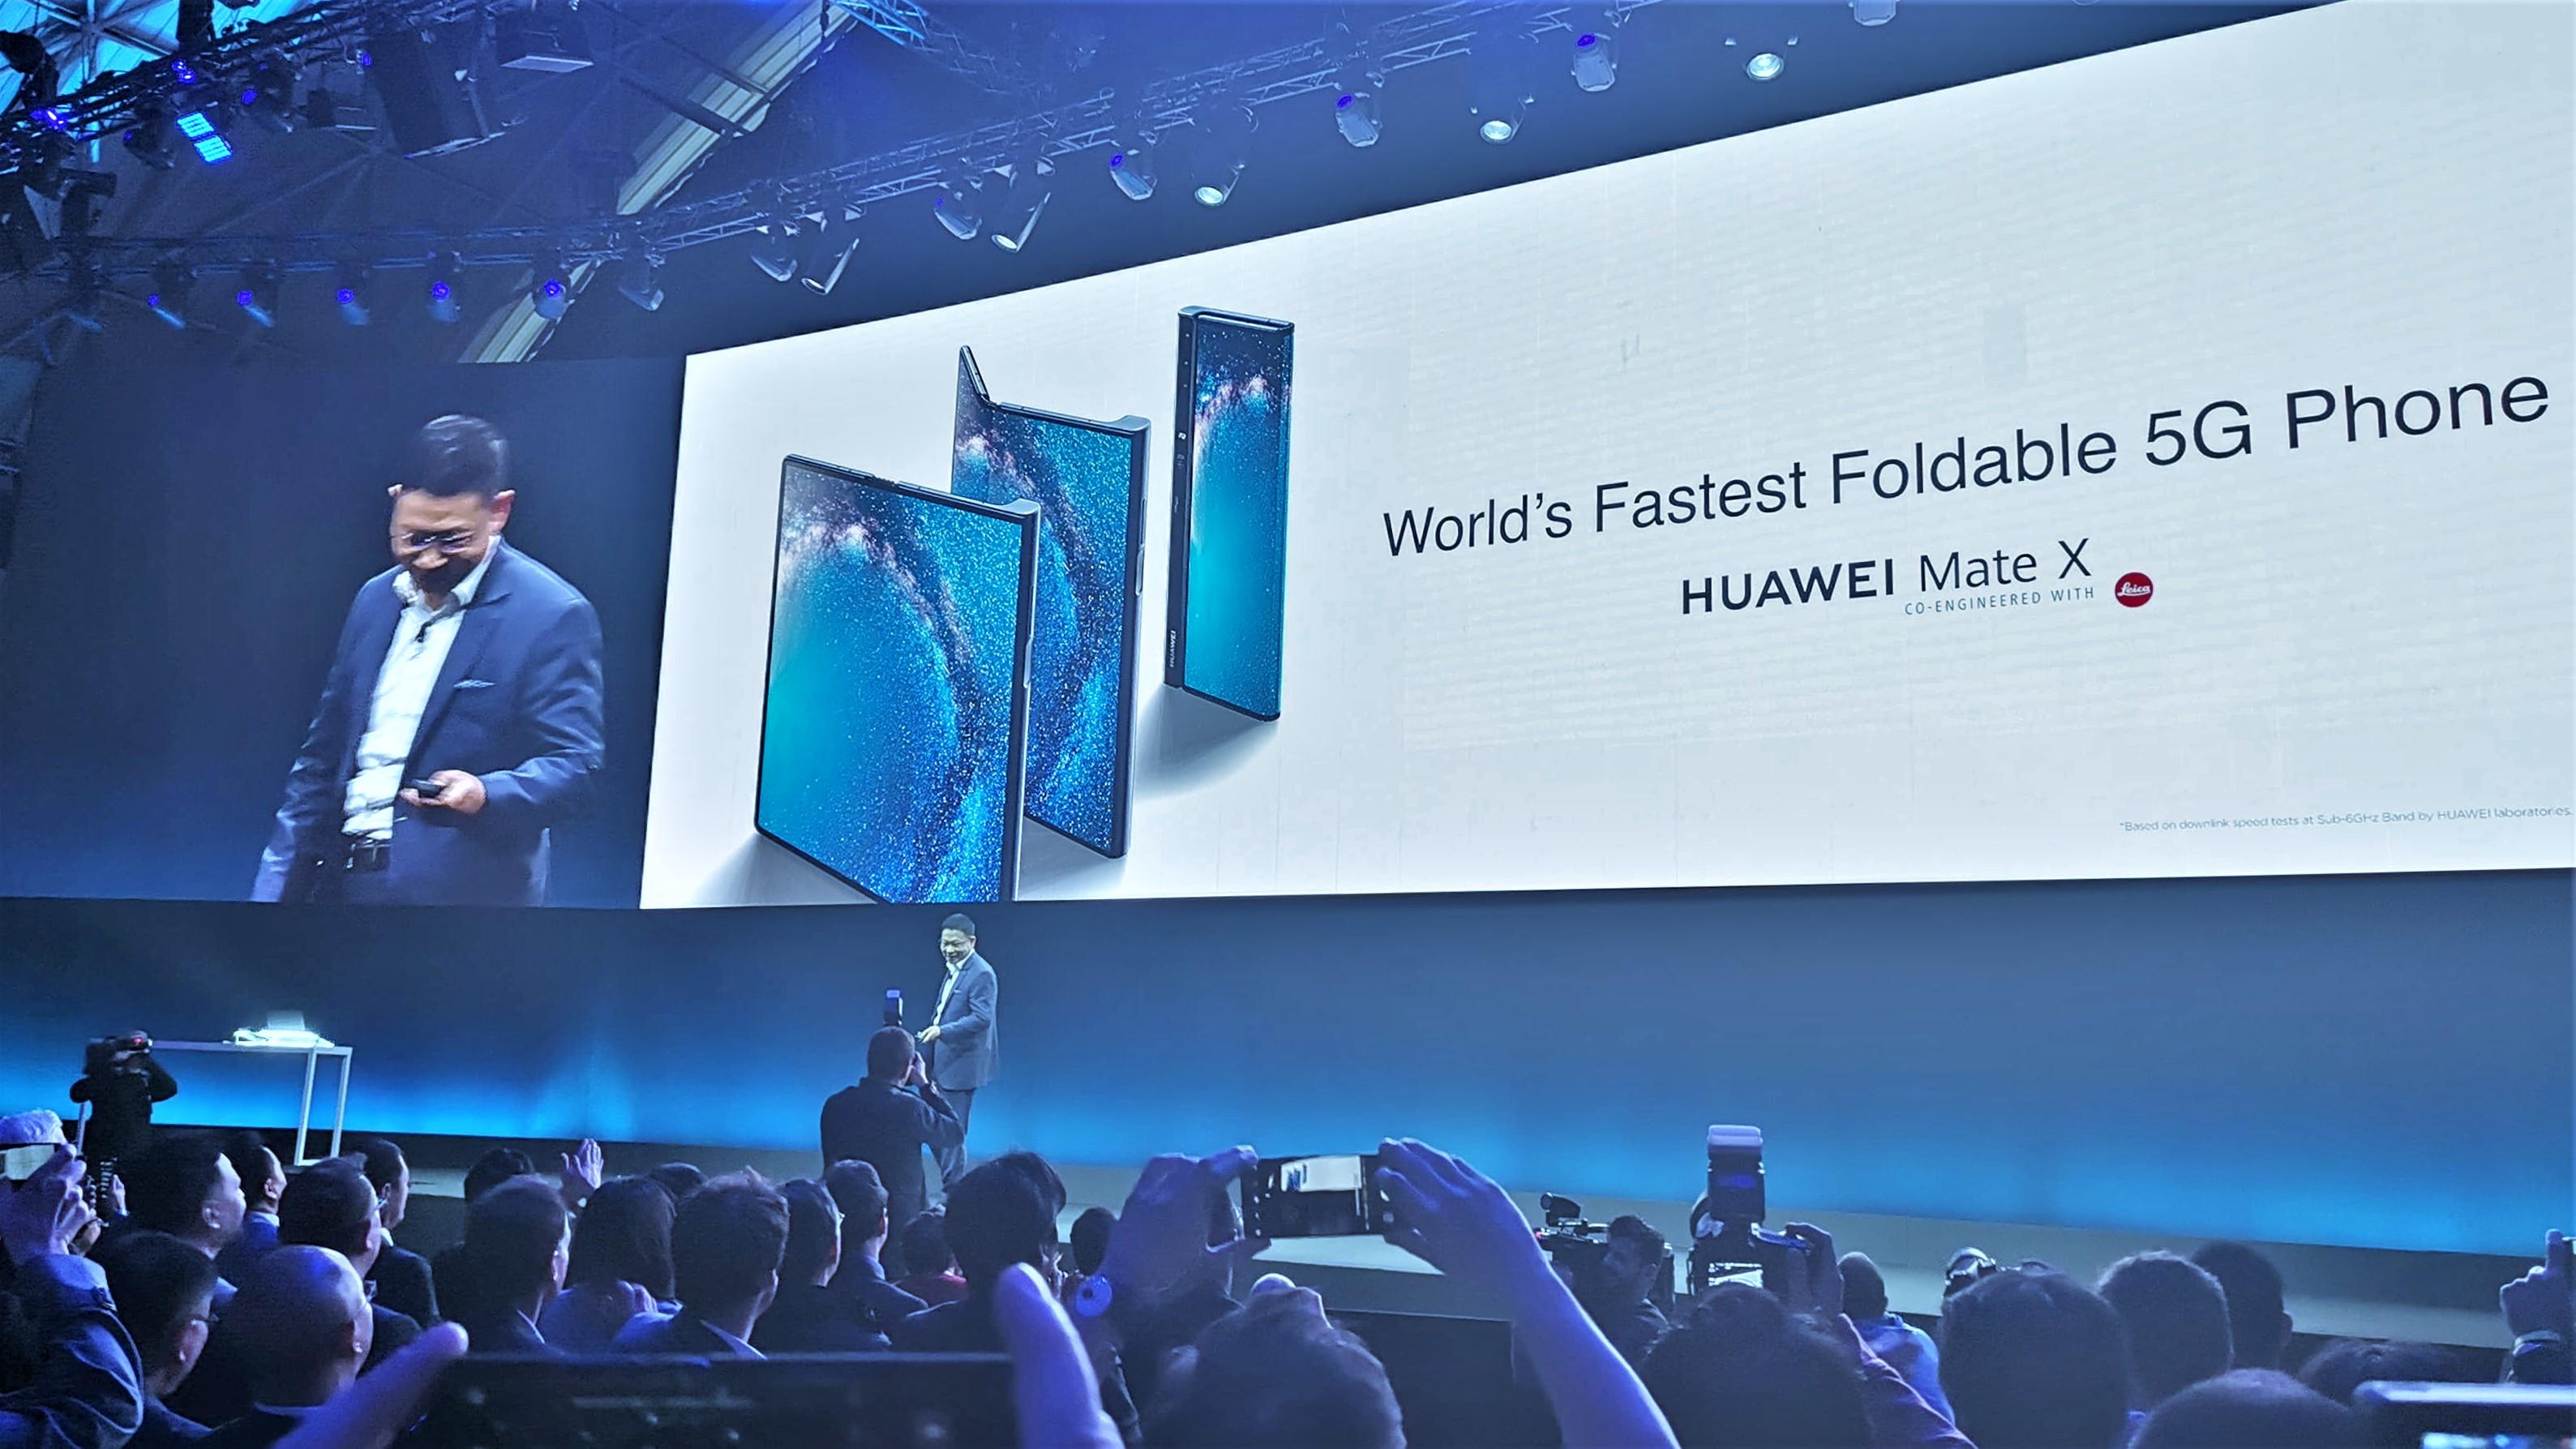 Huawei Mate X (3)